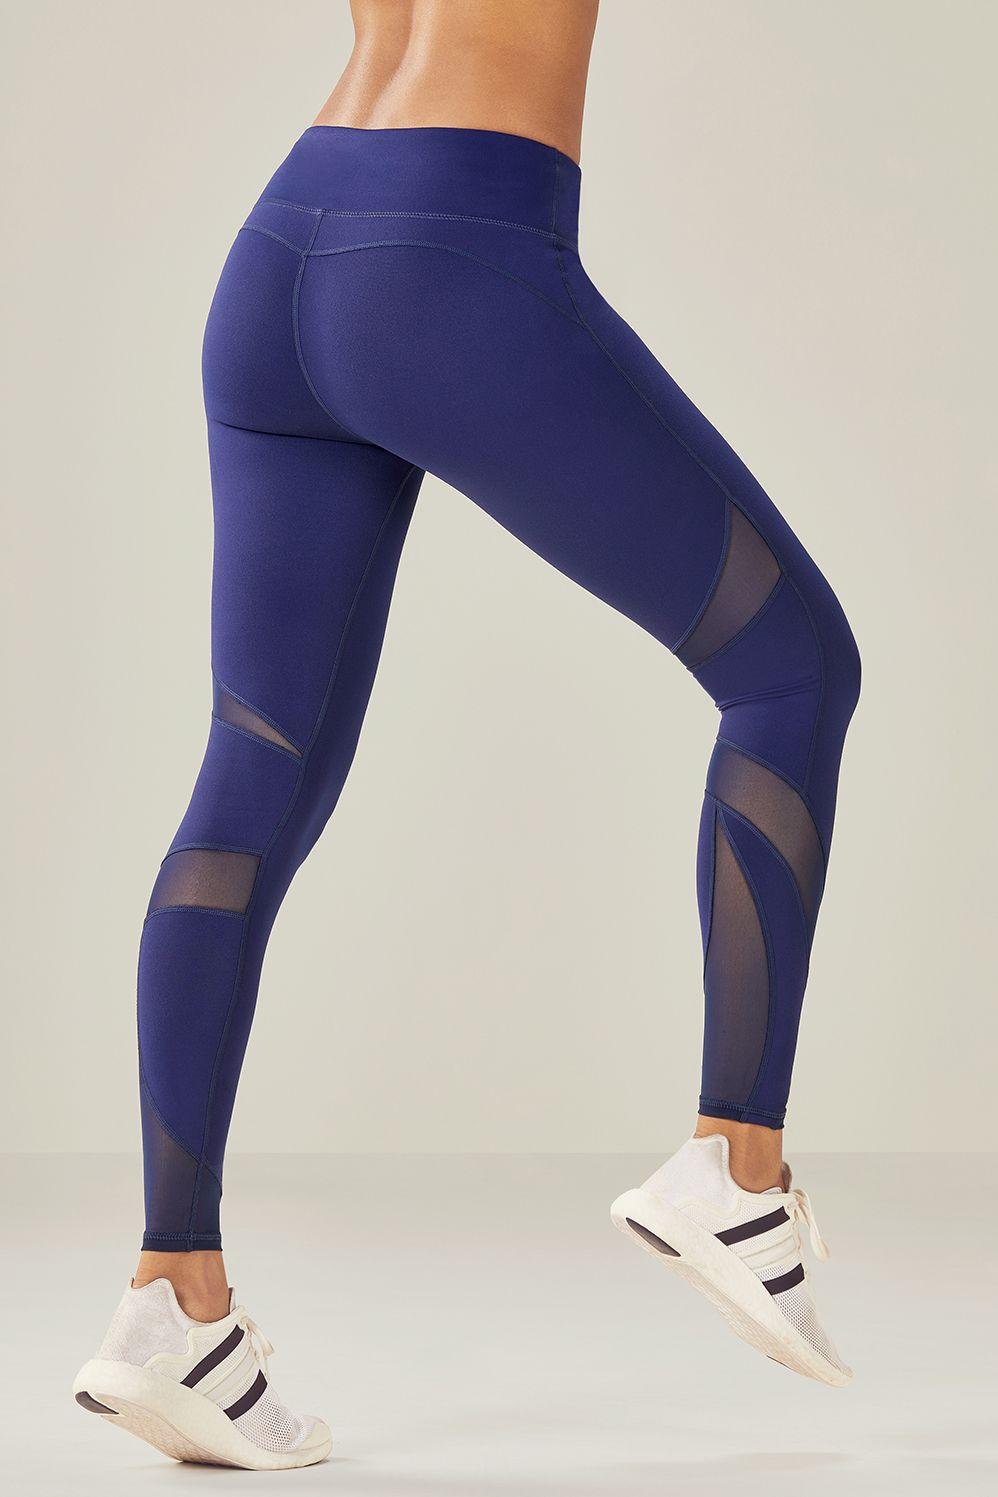 00741a8923ab97 Fabletics Tight Salar Mesh Powerhold Legging Womens Blue Size 1X